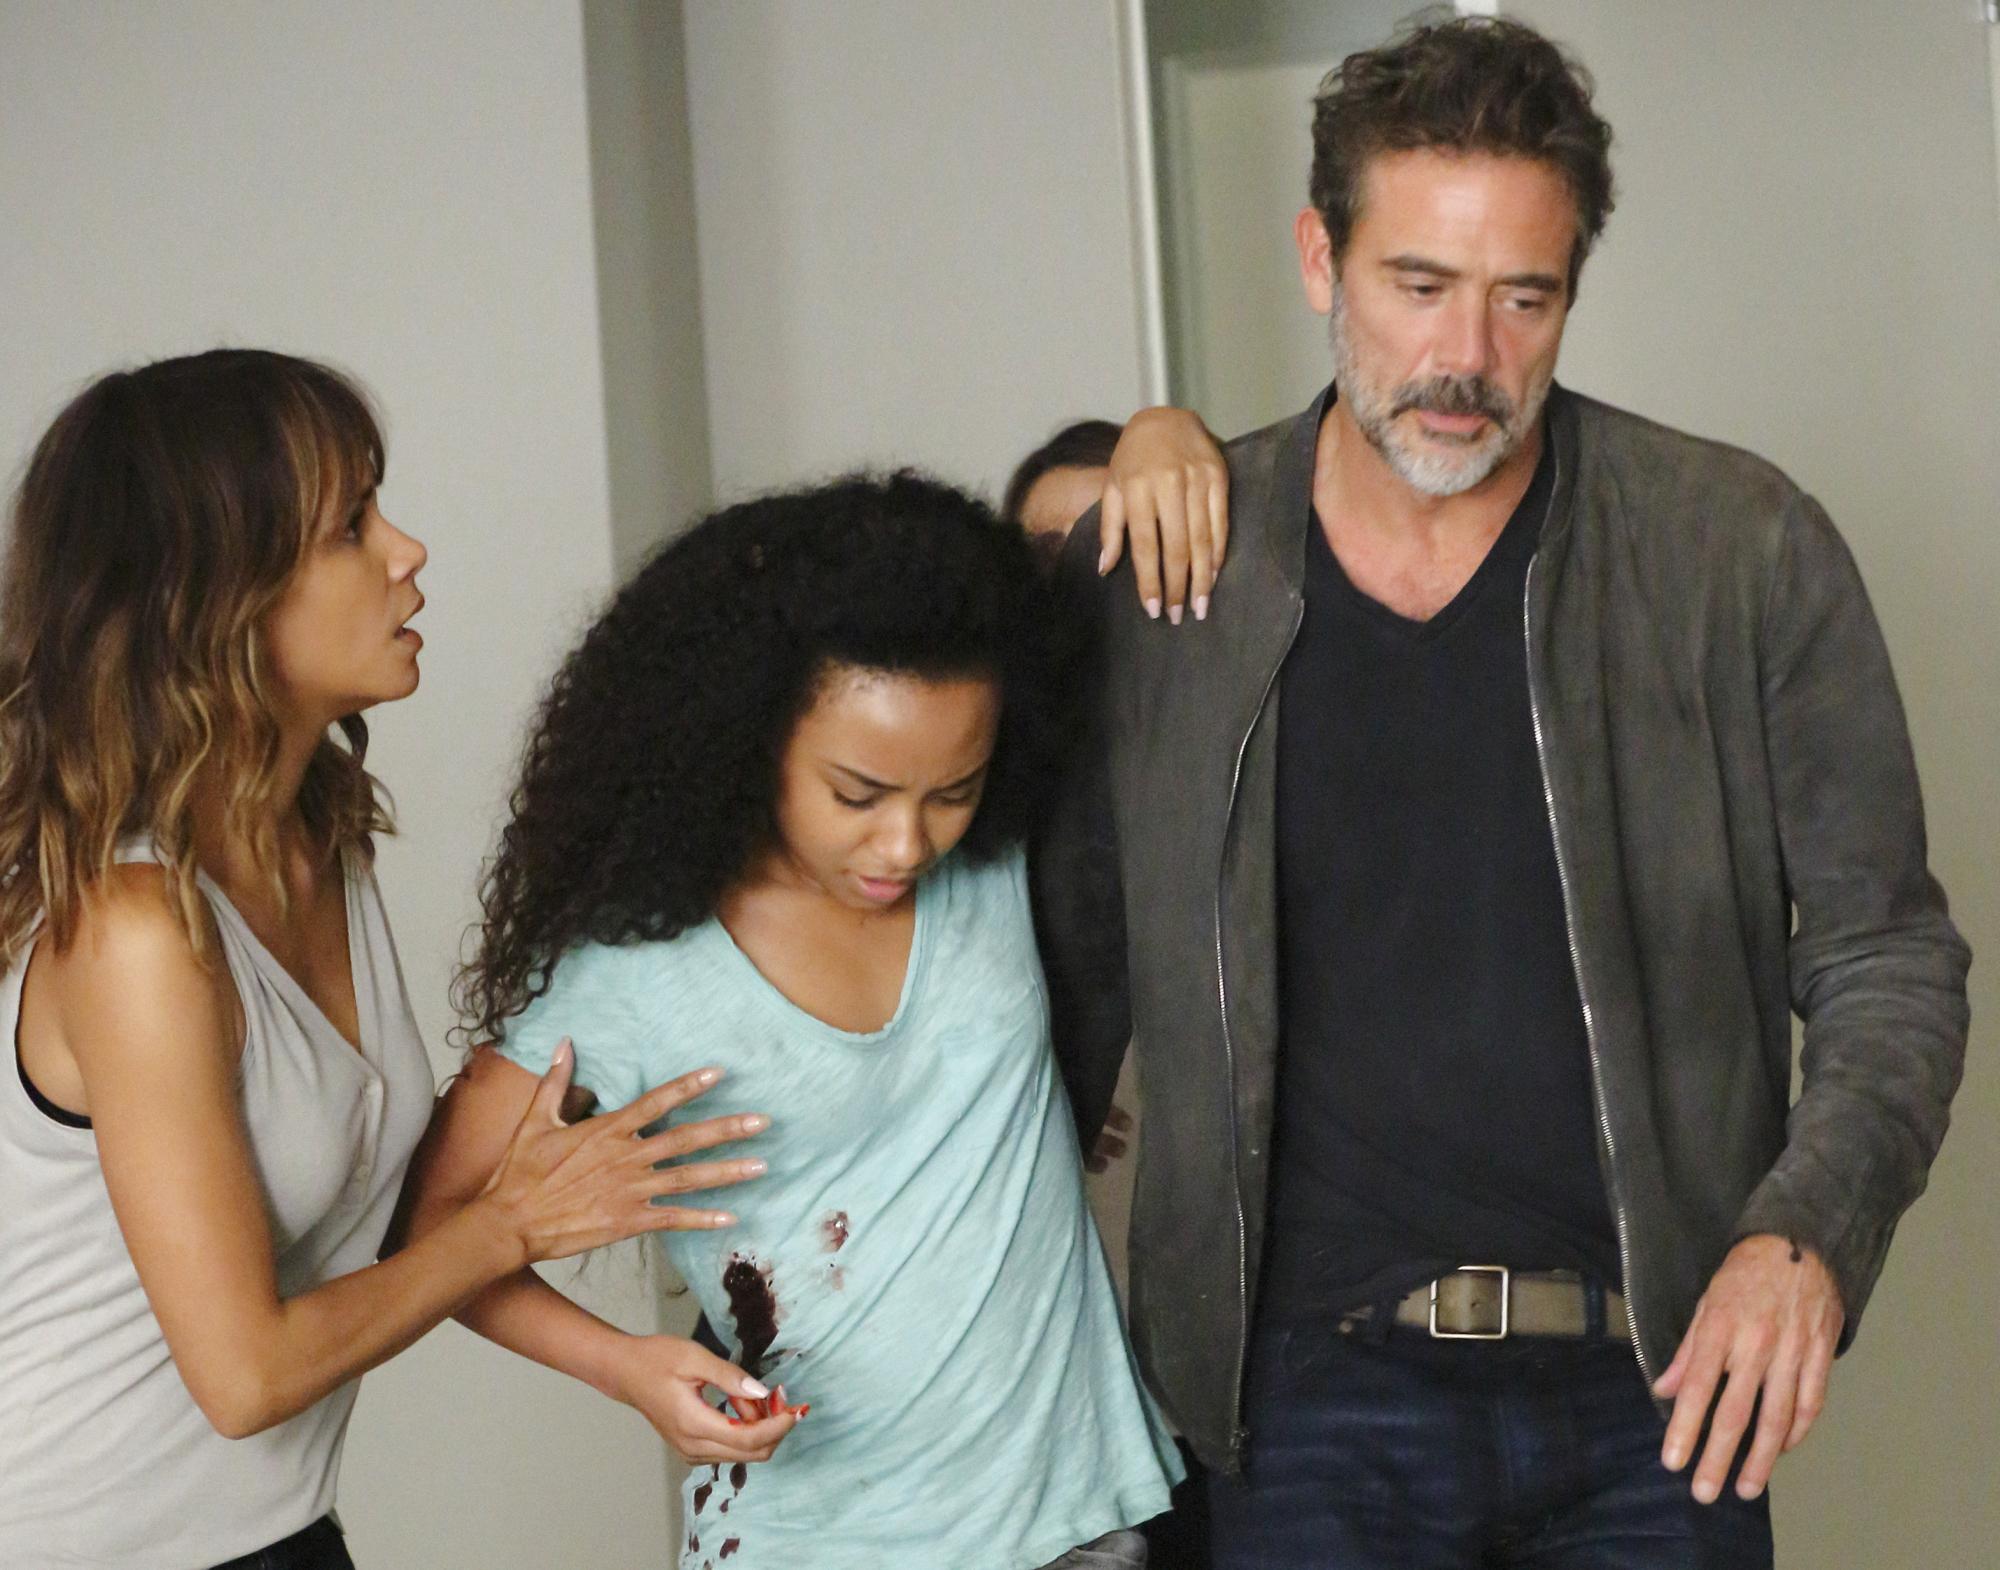 Halle Berry as Molly Woods, McKenna Roberts as Terra, and Jeffrey Dean Morgan as JD Richter.